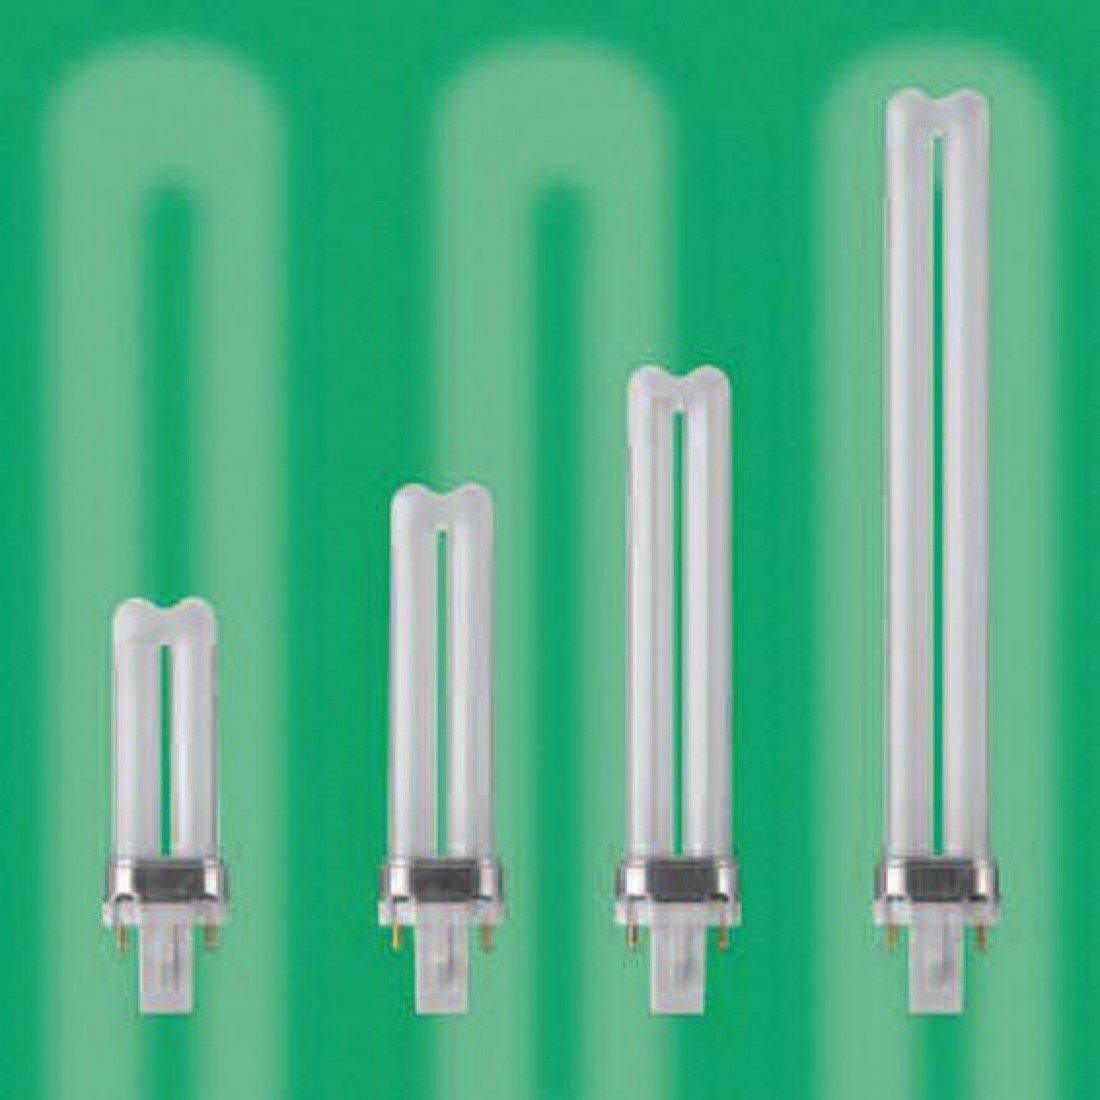 BELL 9W CFL 2 PIN G23 BLS 827 WARM WHITE COMPACT FLUORESCENT LIGHT BULB LAMP